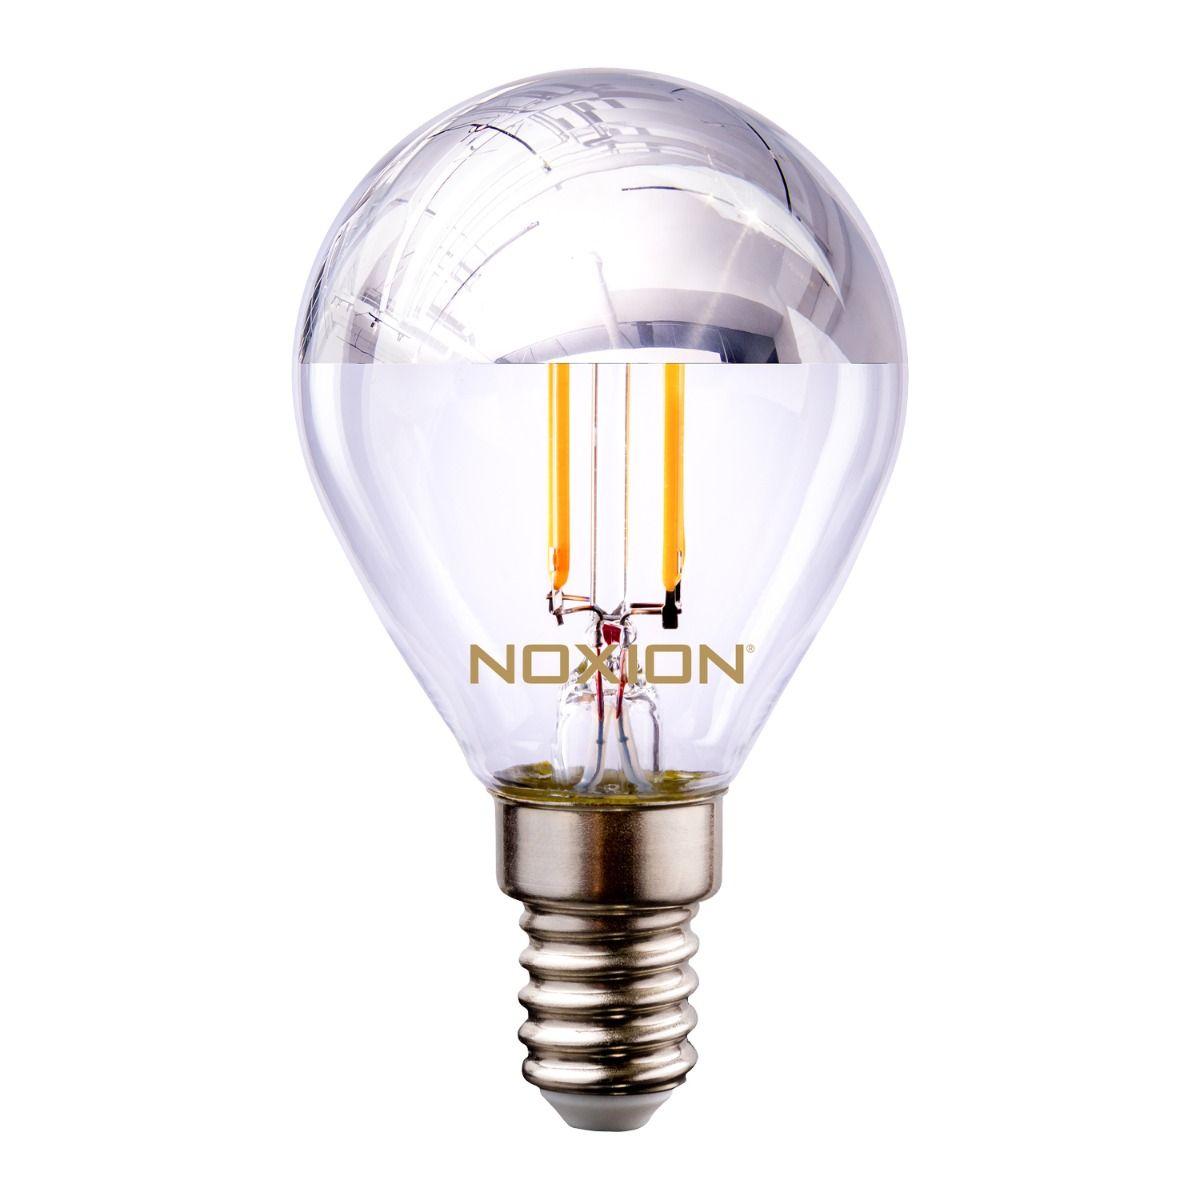 Noxion Lucent Filament LED Lustre Silver Mirror P45 E14 220-240V 4.5W 400LM CRI80 2700K ND (40W eqv)